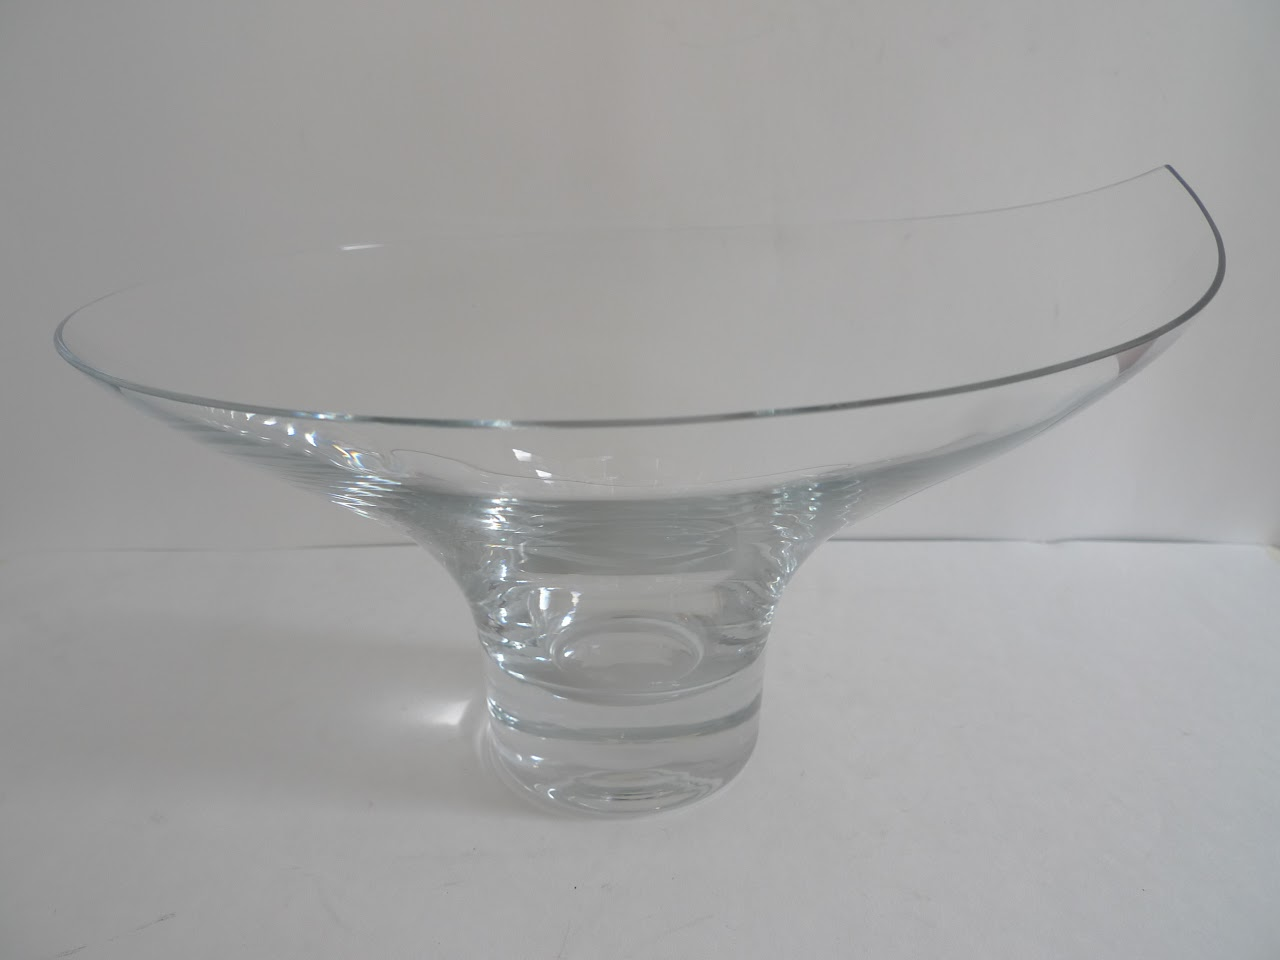 Rosenthal Crystal Serving Bowl